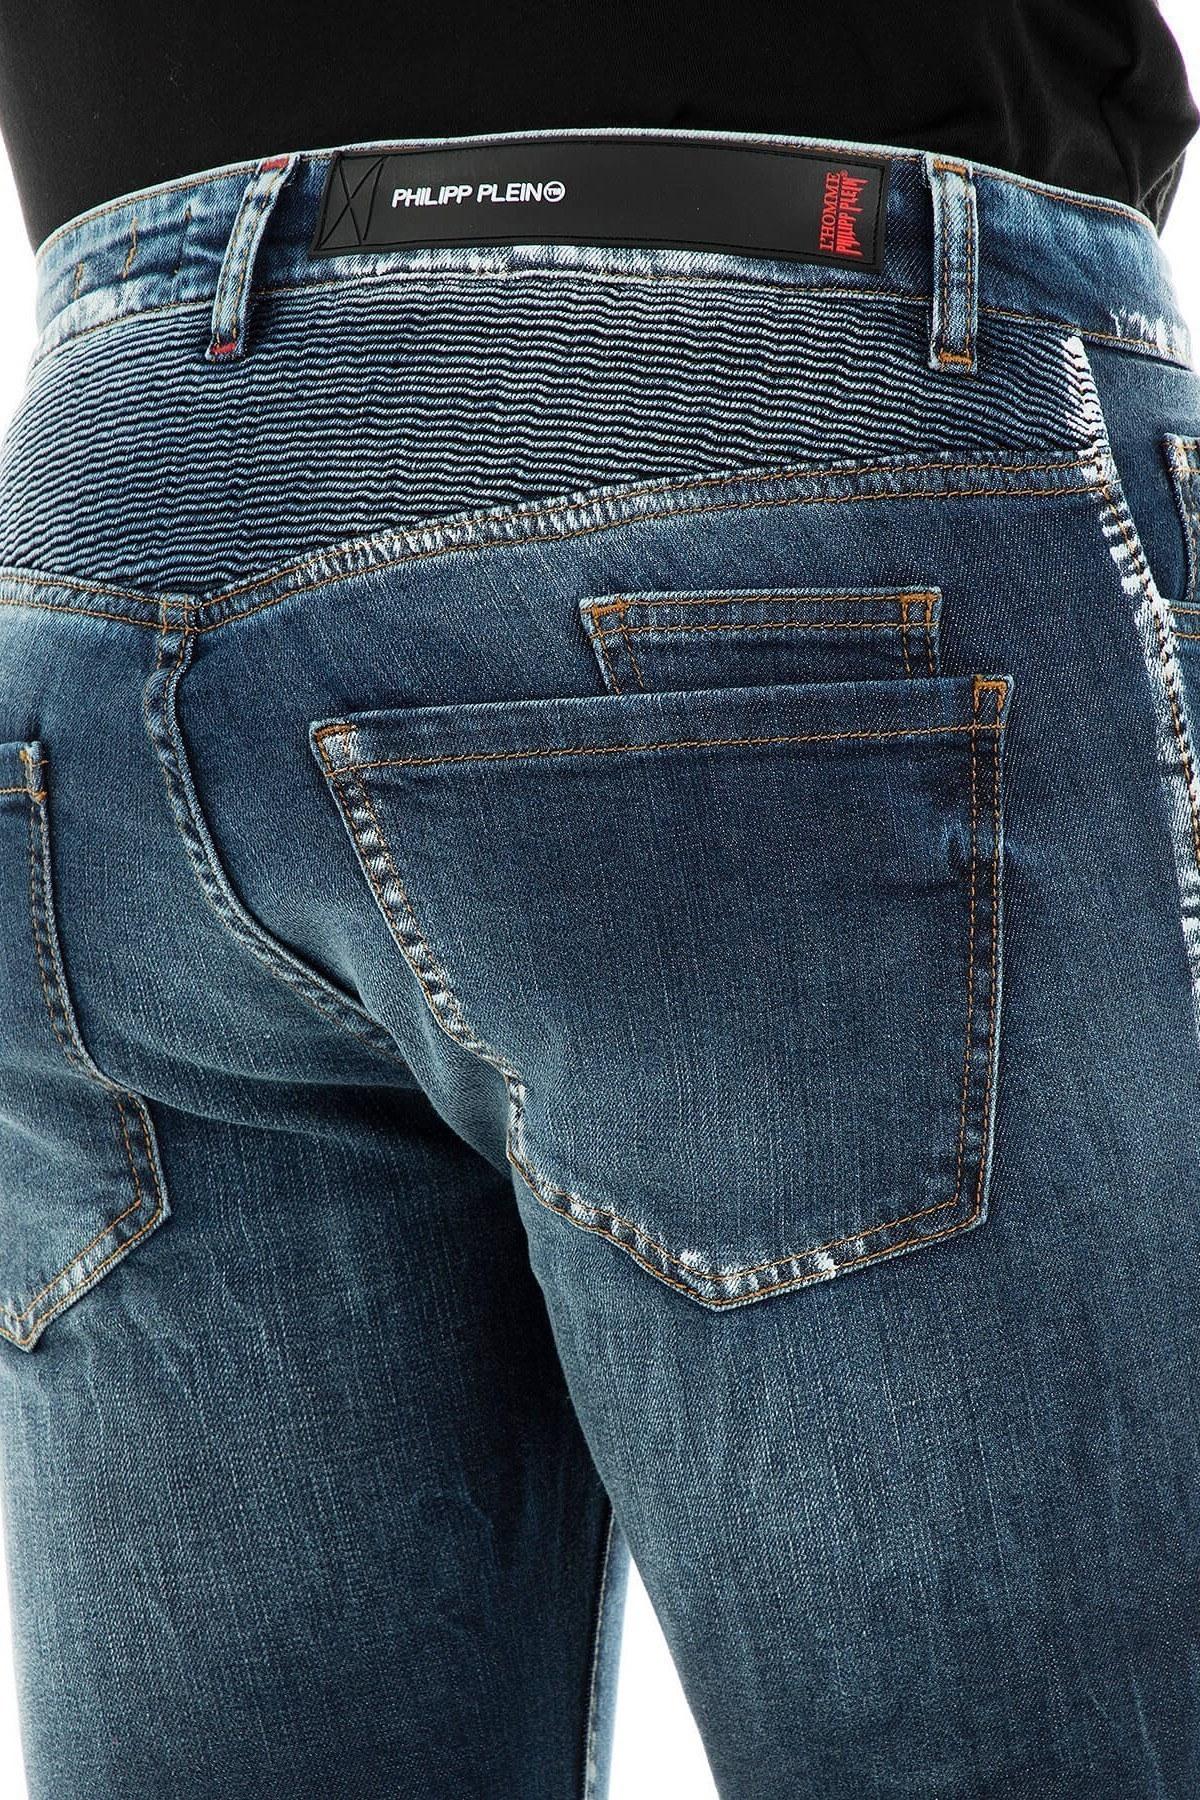 Philipp Plein Jeans Erkek Kot Pantolon S19C MDT1421 PDE004N 085A LACİVERT